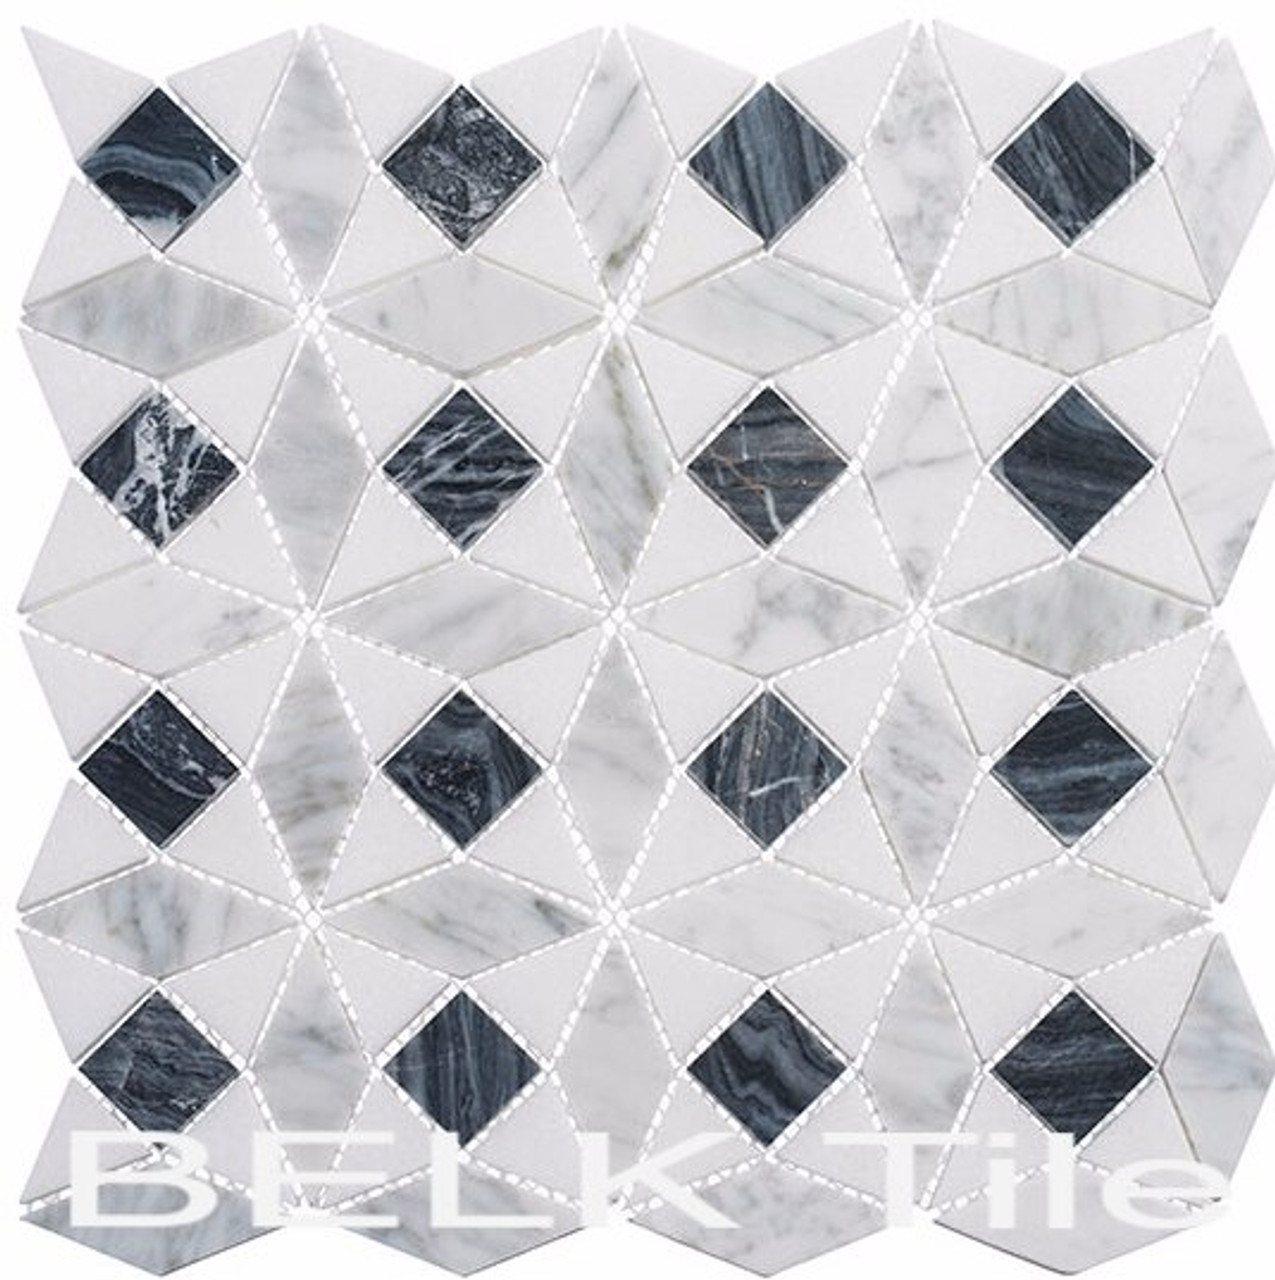 Bella Glass Tiles Divine Windows Russian Renaissance